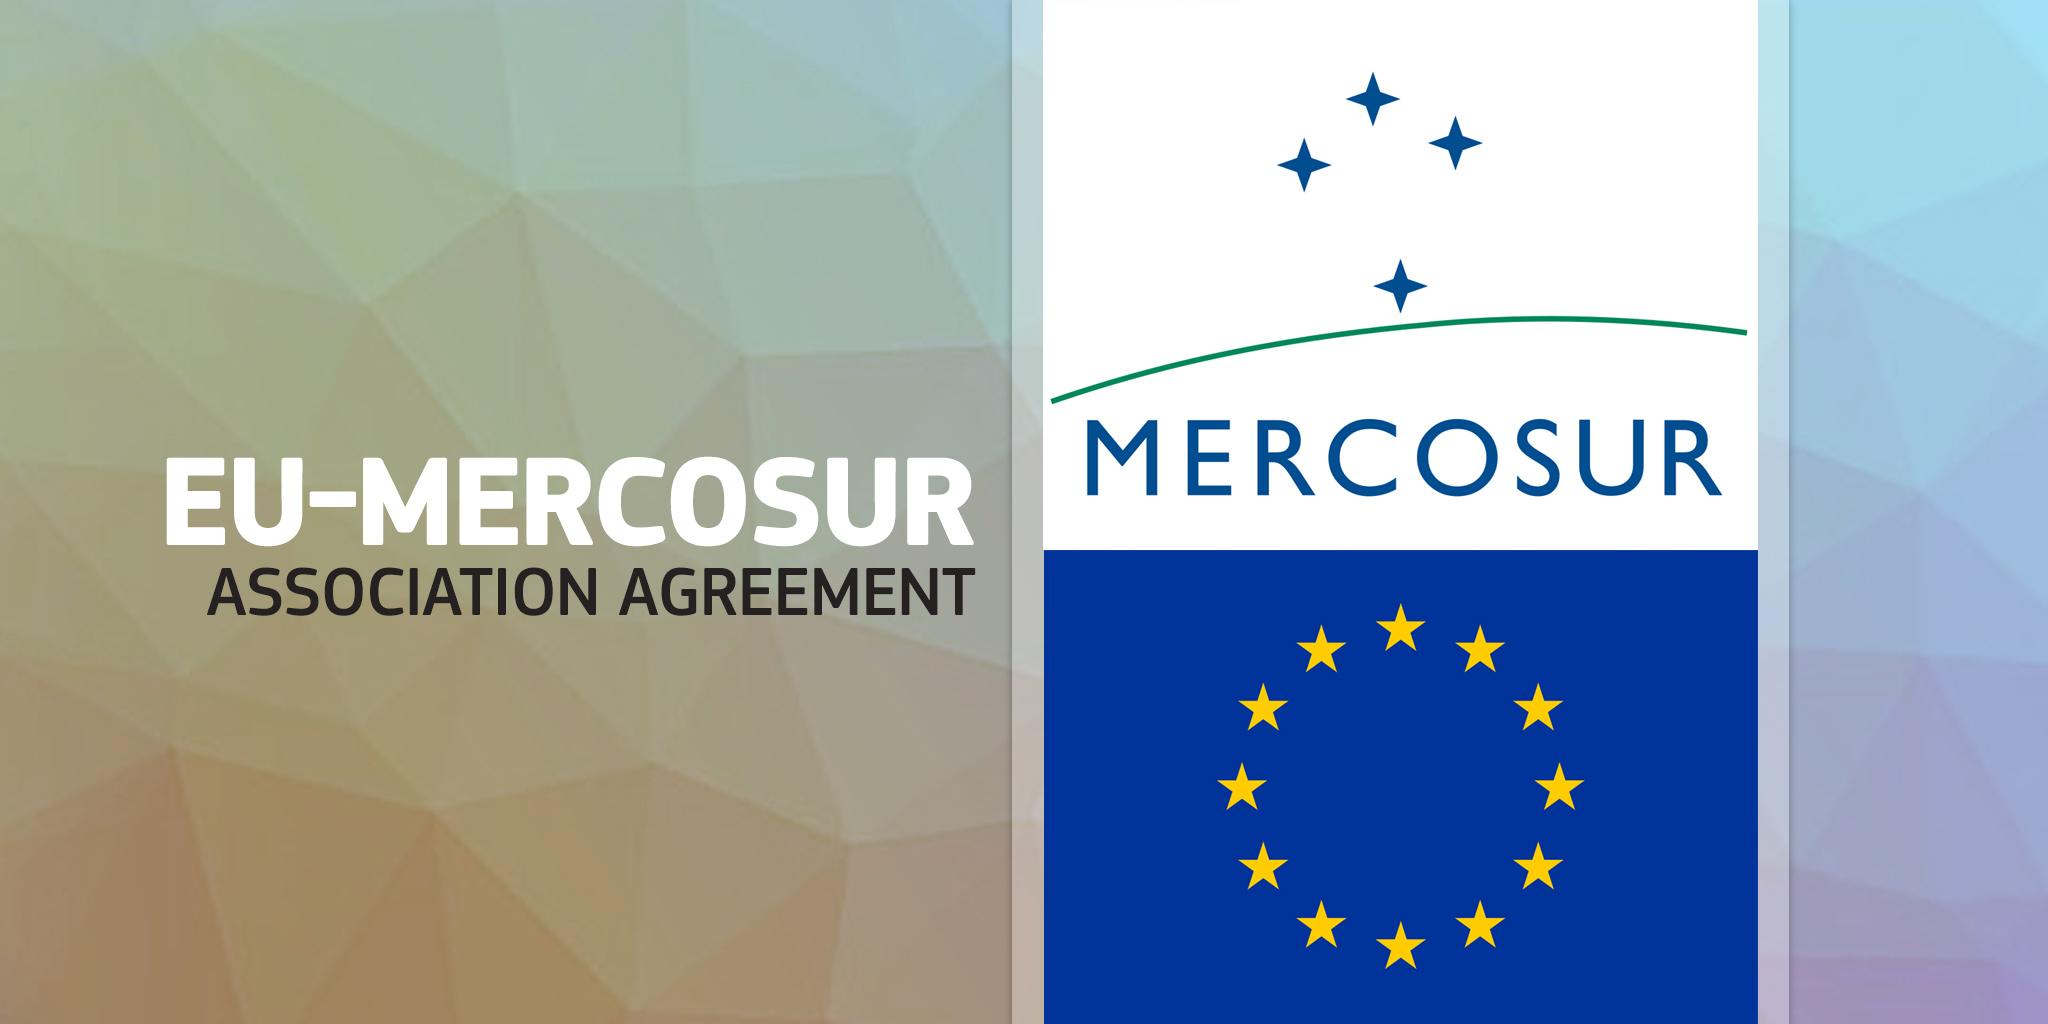 eu-mercosur trade agreement - trade